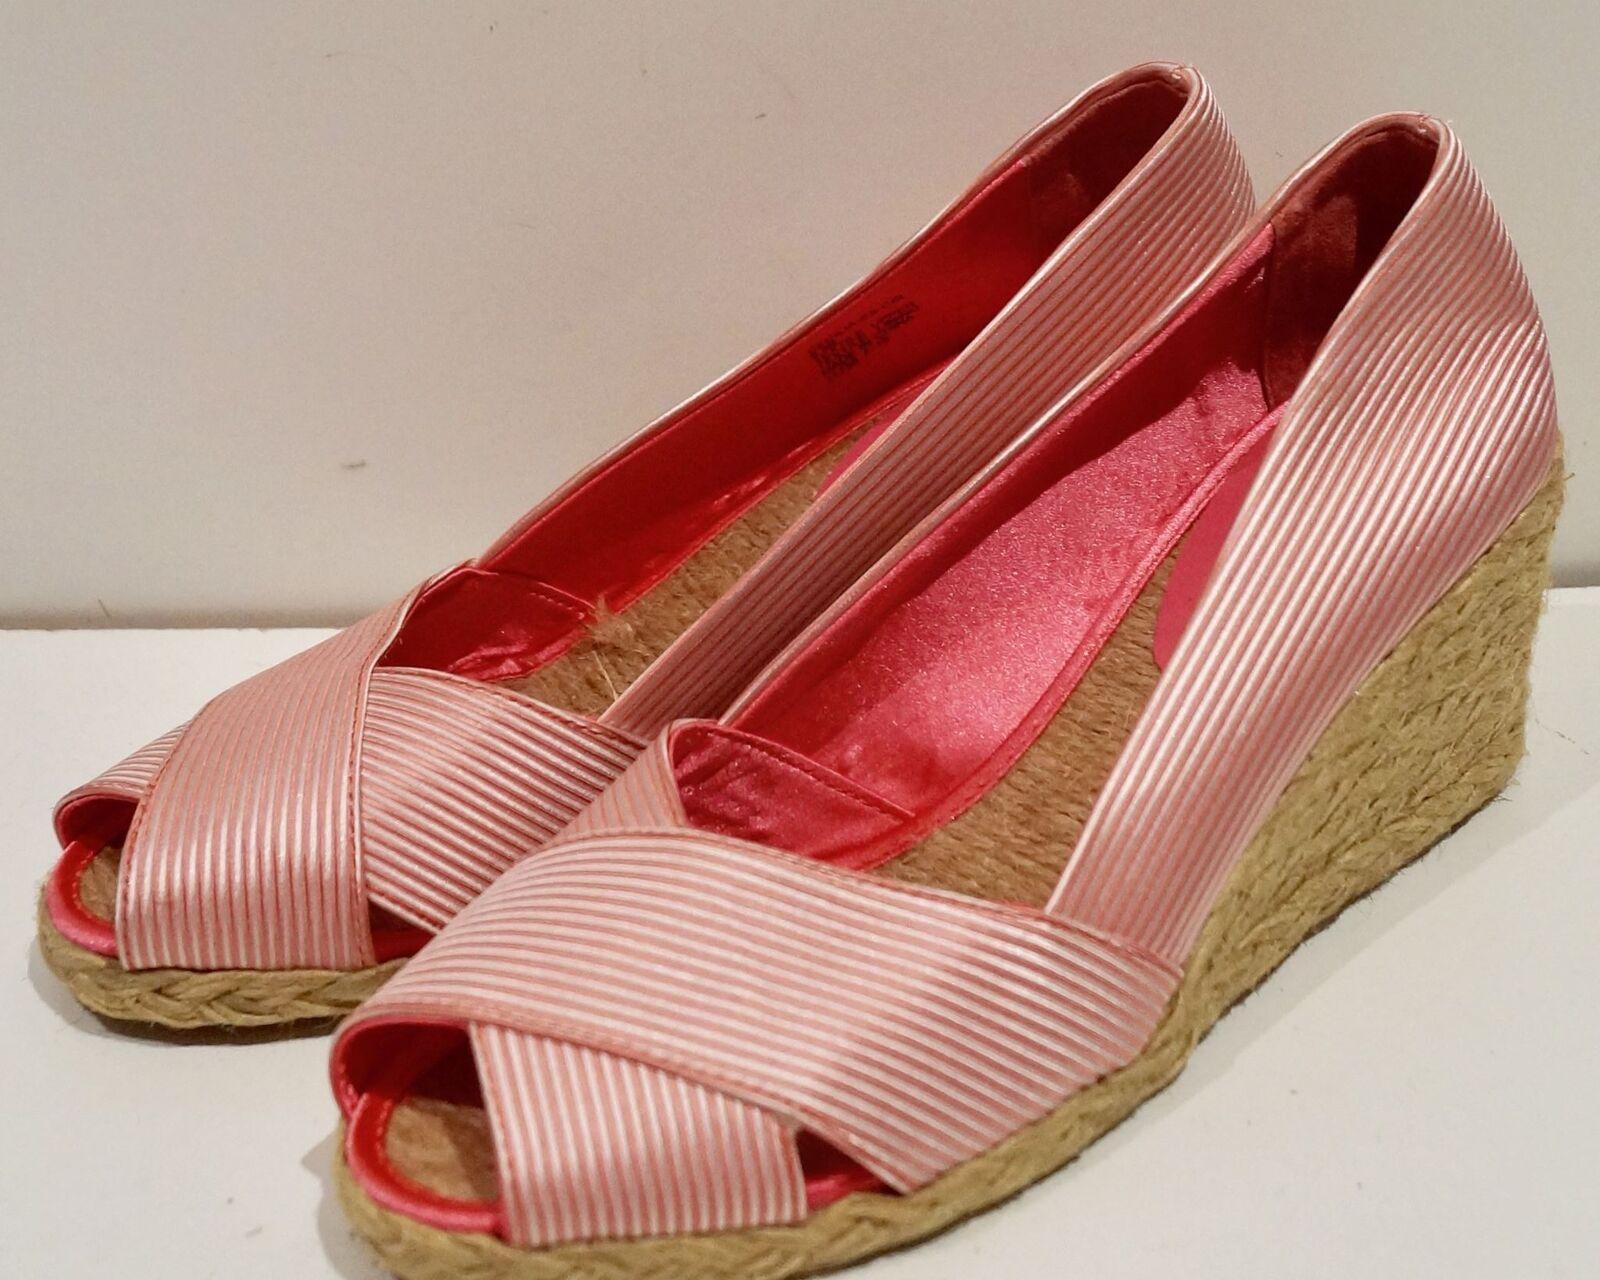 LAUREN RALPH LAUREN Pink Striped Peep Toe UK7.5 Espadrilles Wedges Sandales 9.5B UK7.5 Toe 6e3cfa